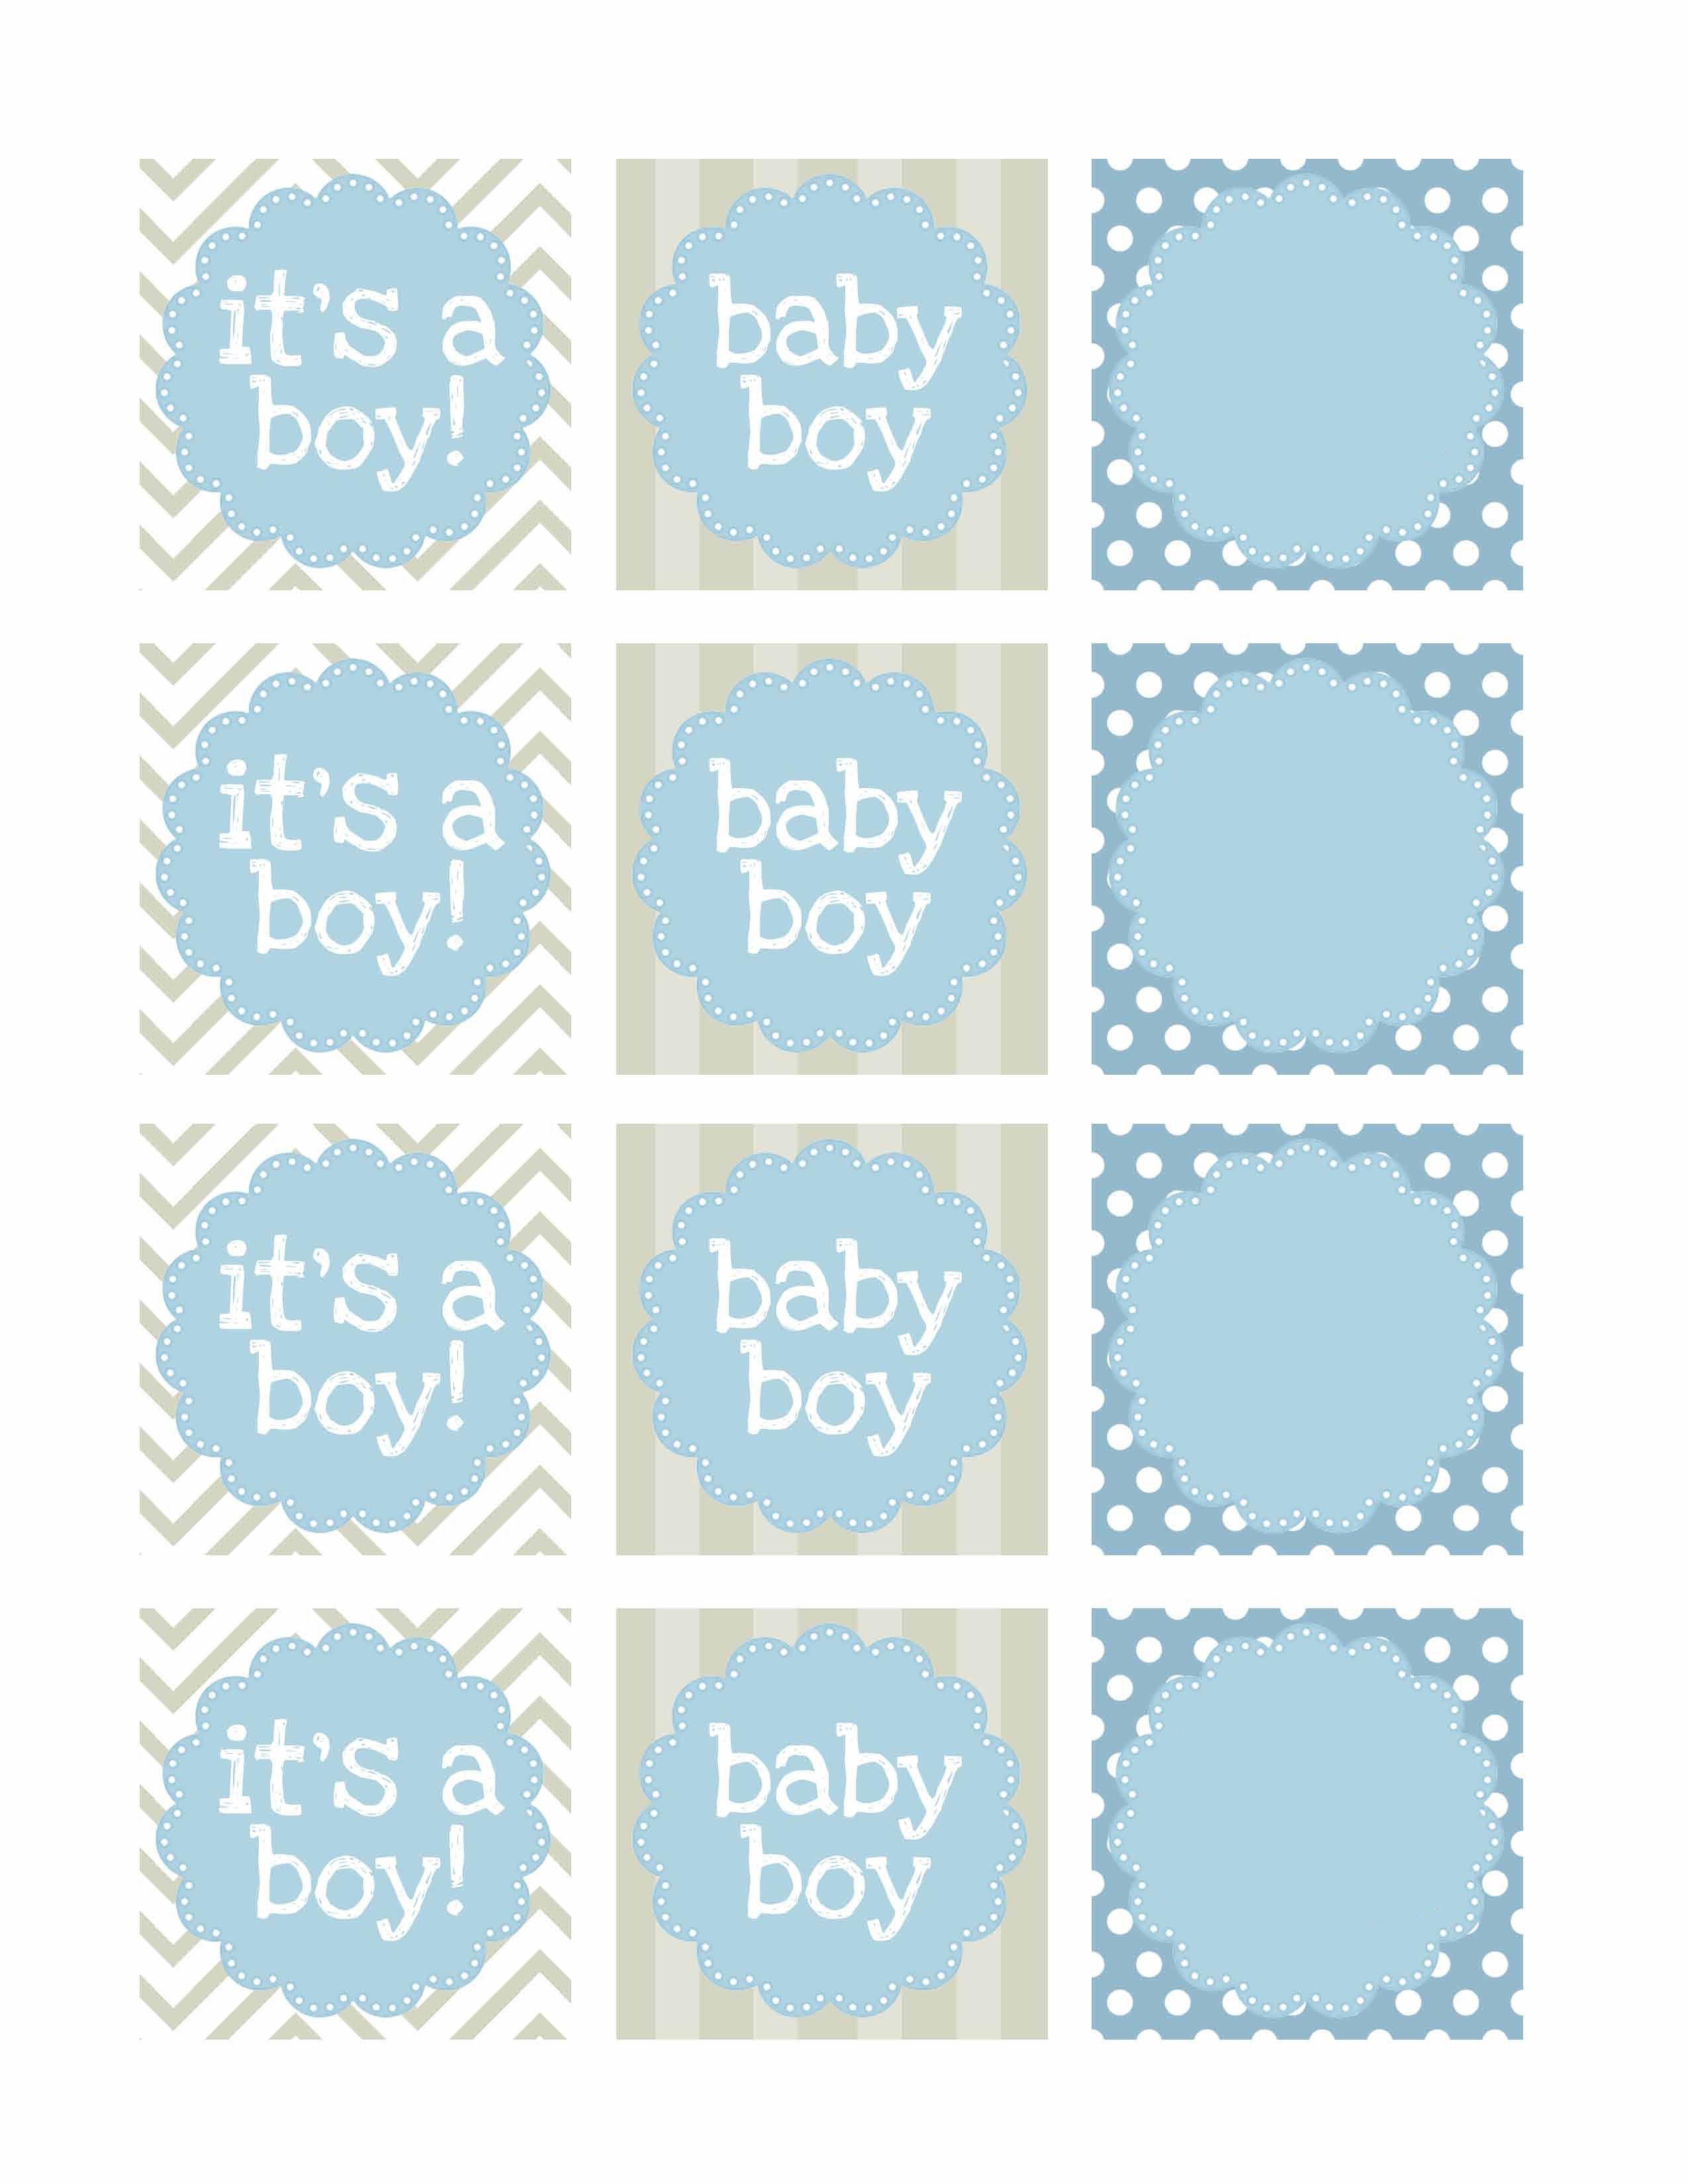 Boy Baby Shower Free Printables   Printable   Návody, Nápady, Tisk - Free Printable Baby Shower Labels And Tags